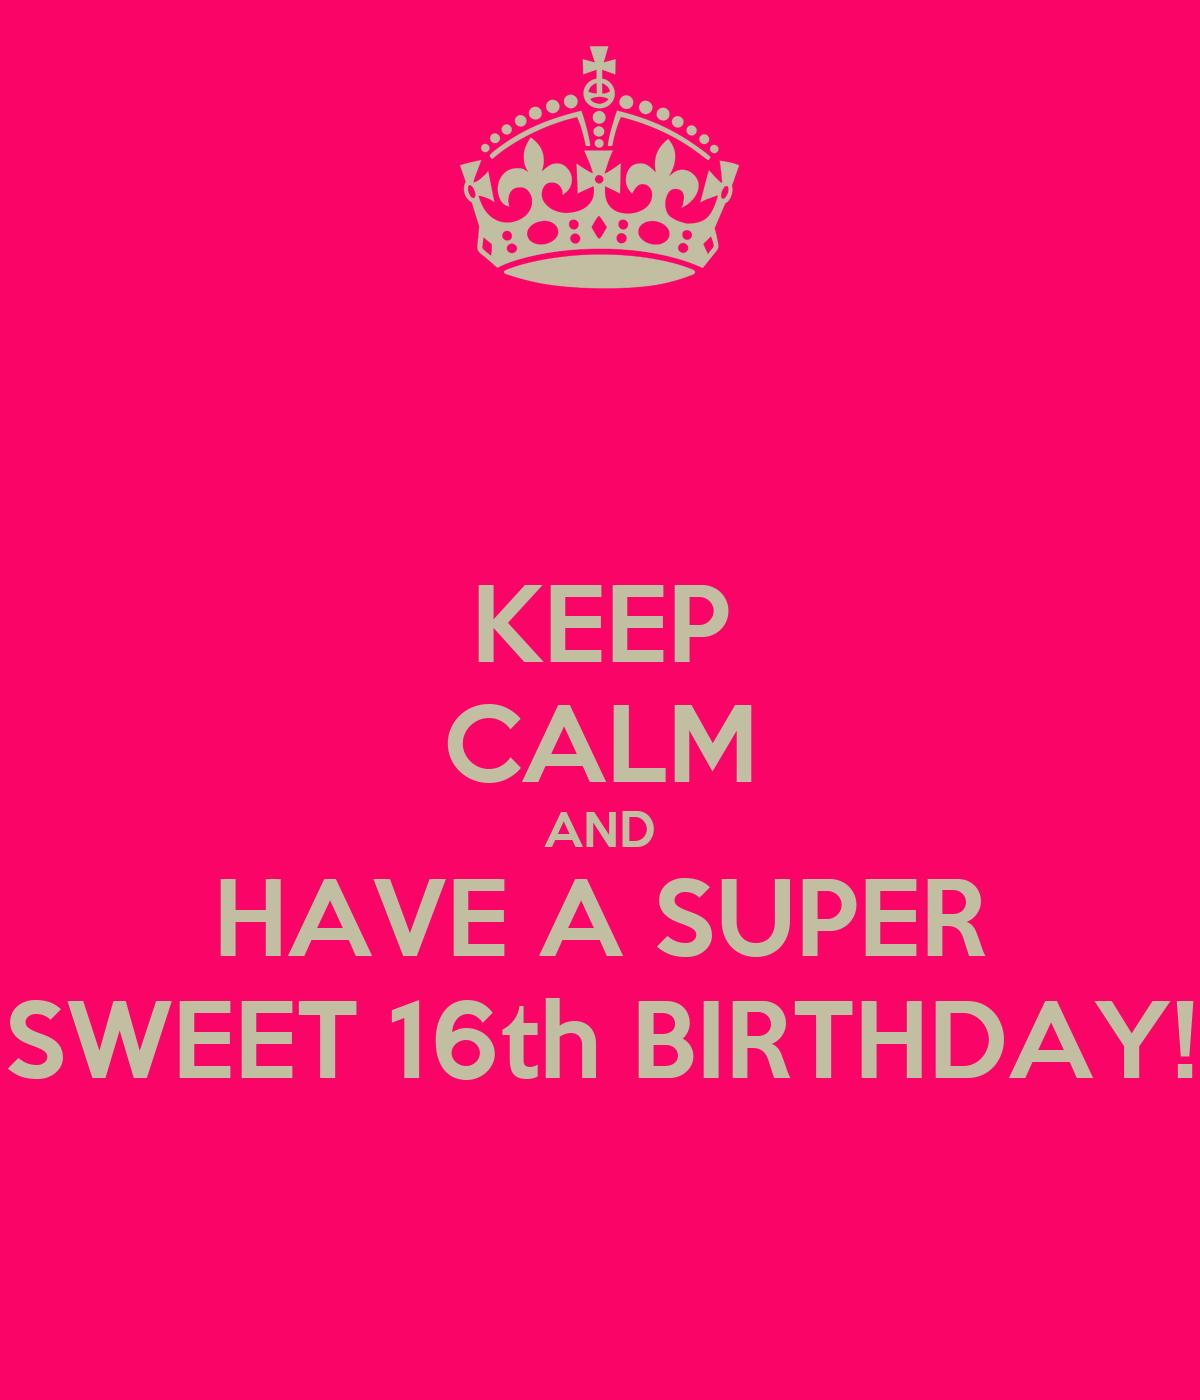 Happy Sweet 16 Birthday Cards Memes